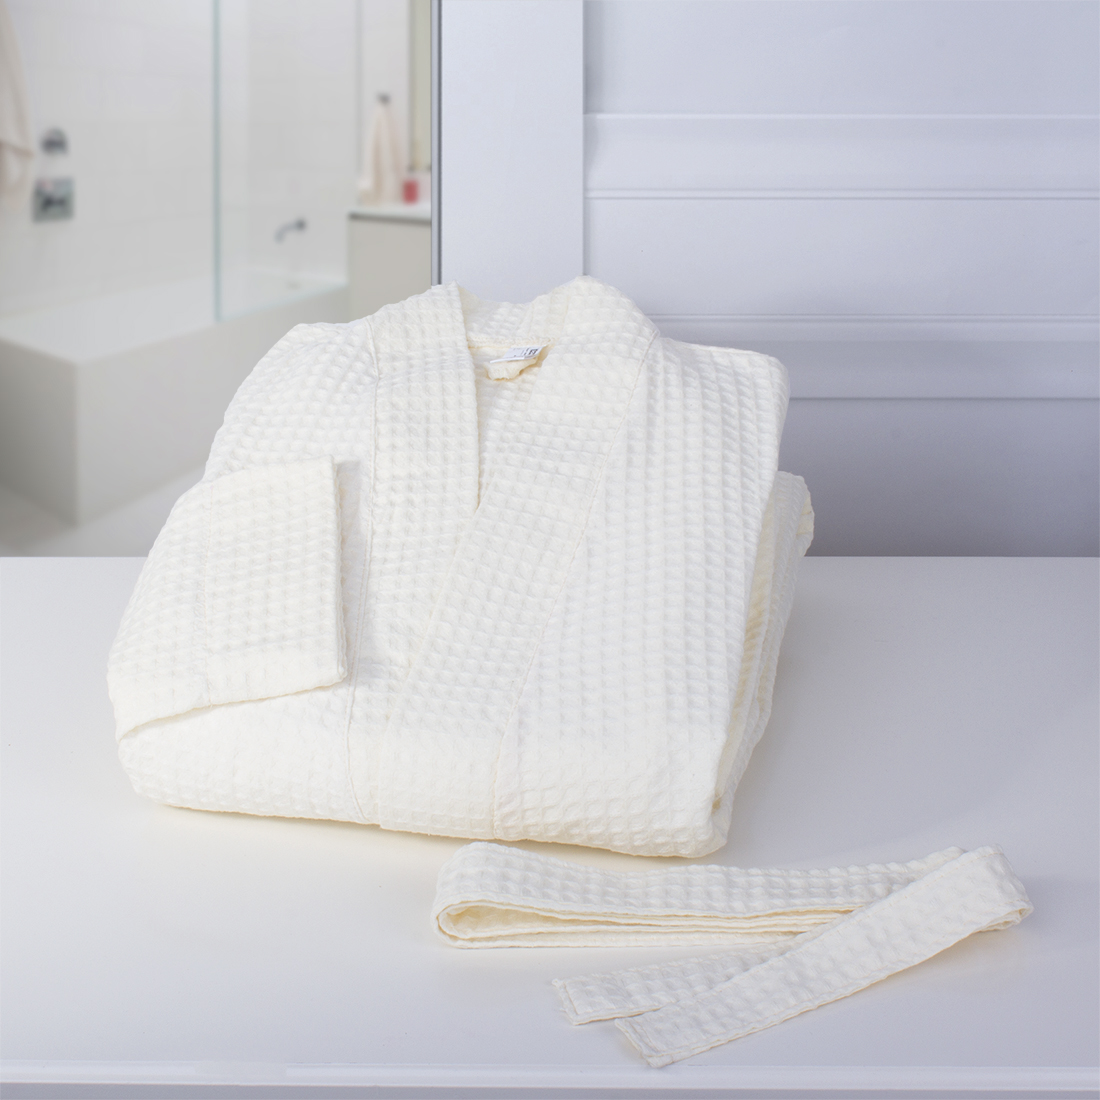 Халат-кимоно Dome  Ribbed , цвет: молочный. Размер L -  Баня, сауна